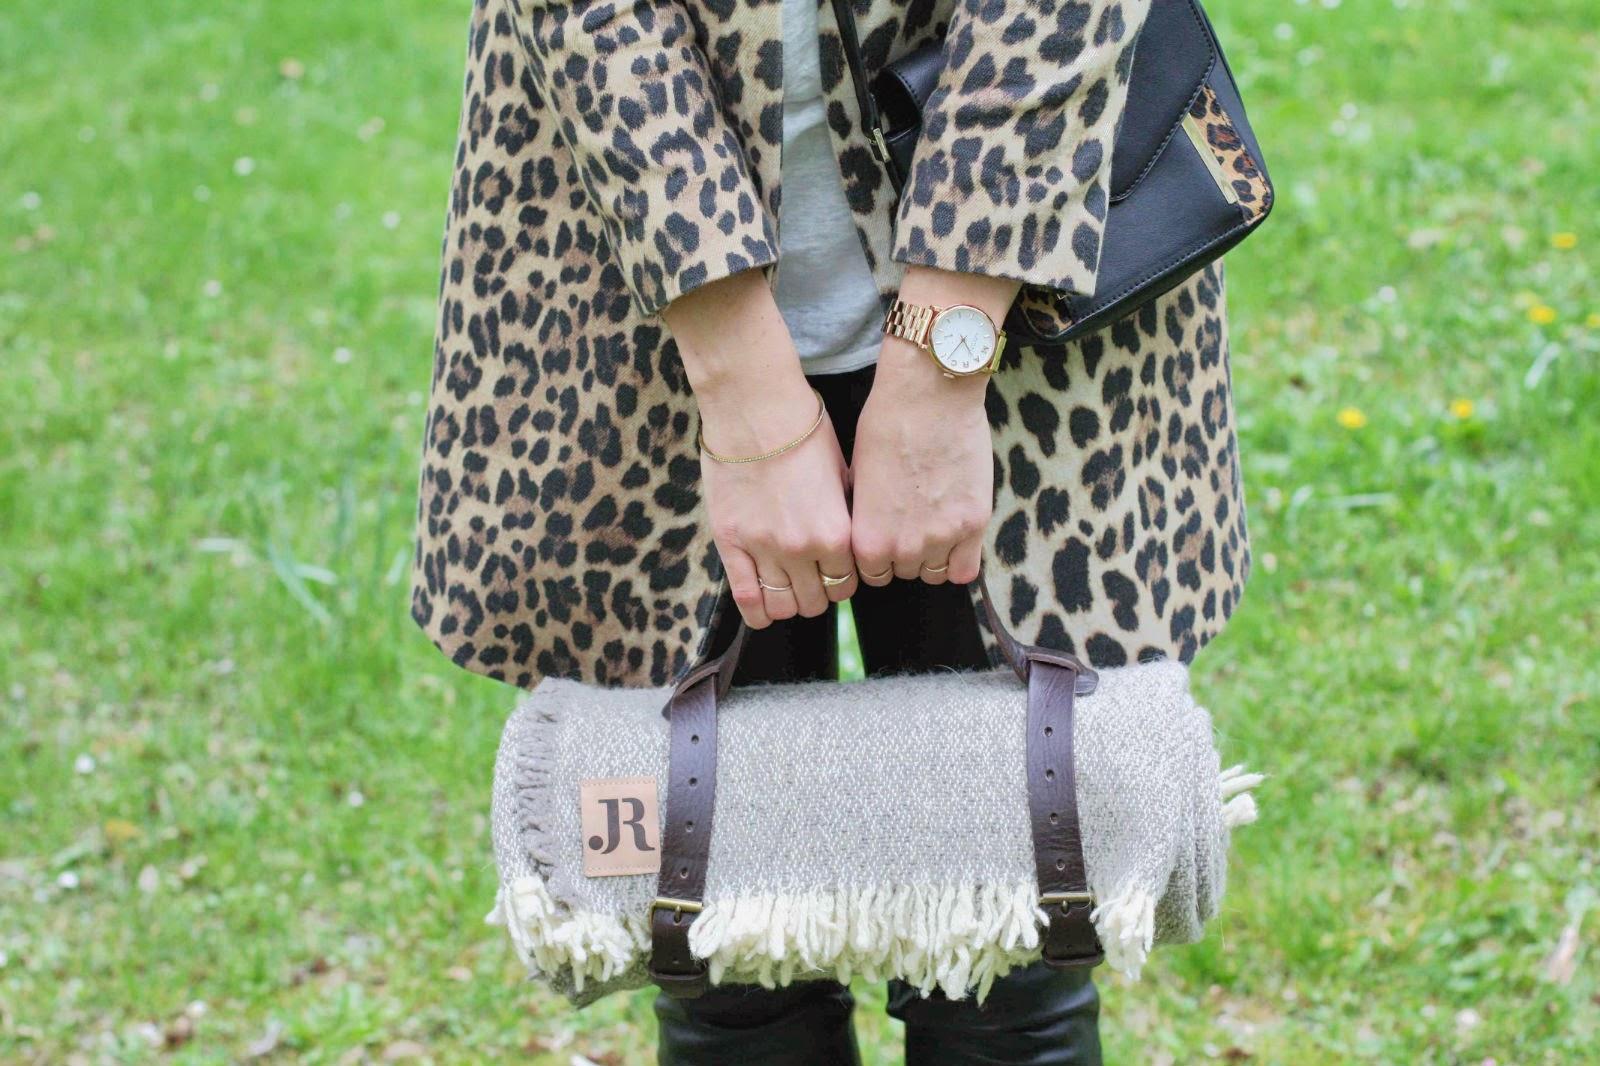 Gebrüder Götz, Birkenstock, Schuhe, Modeblog, Fashionblog, Fashion Blog